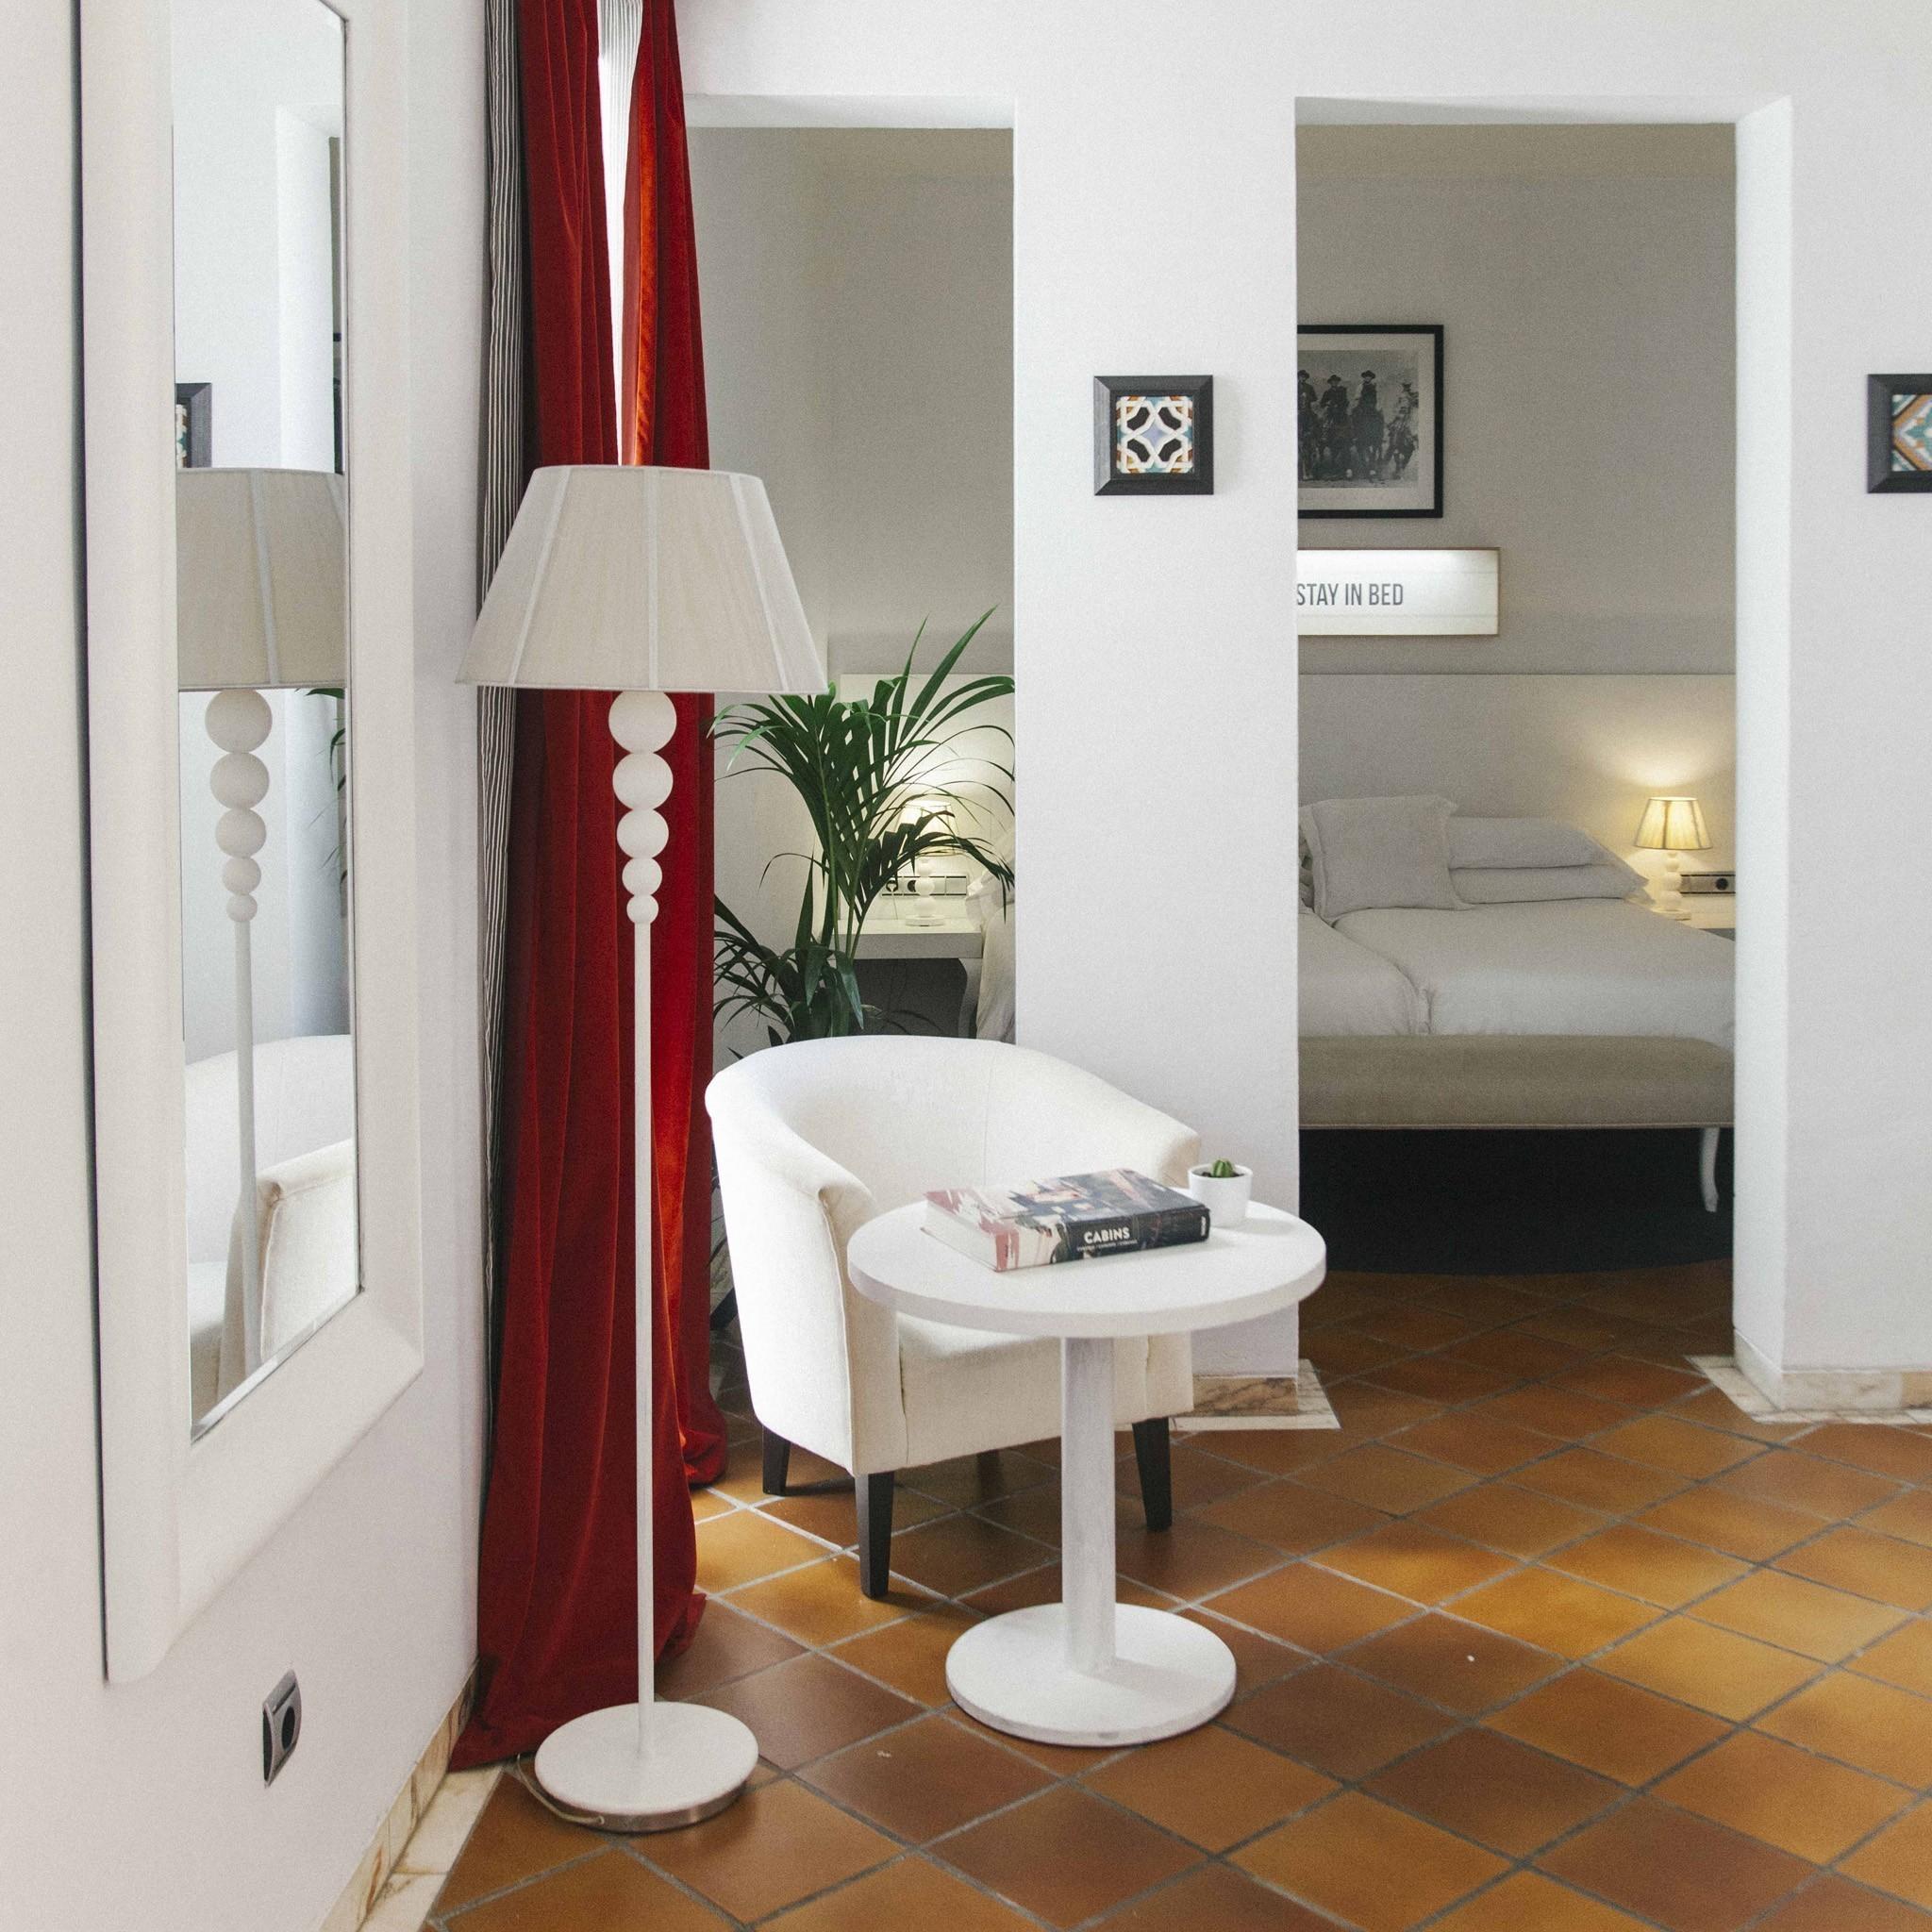 Habitaciones familiares hotel fontecruz sevilla seises for Habitaciones familiares lisboa